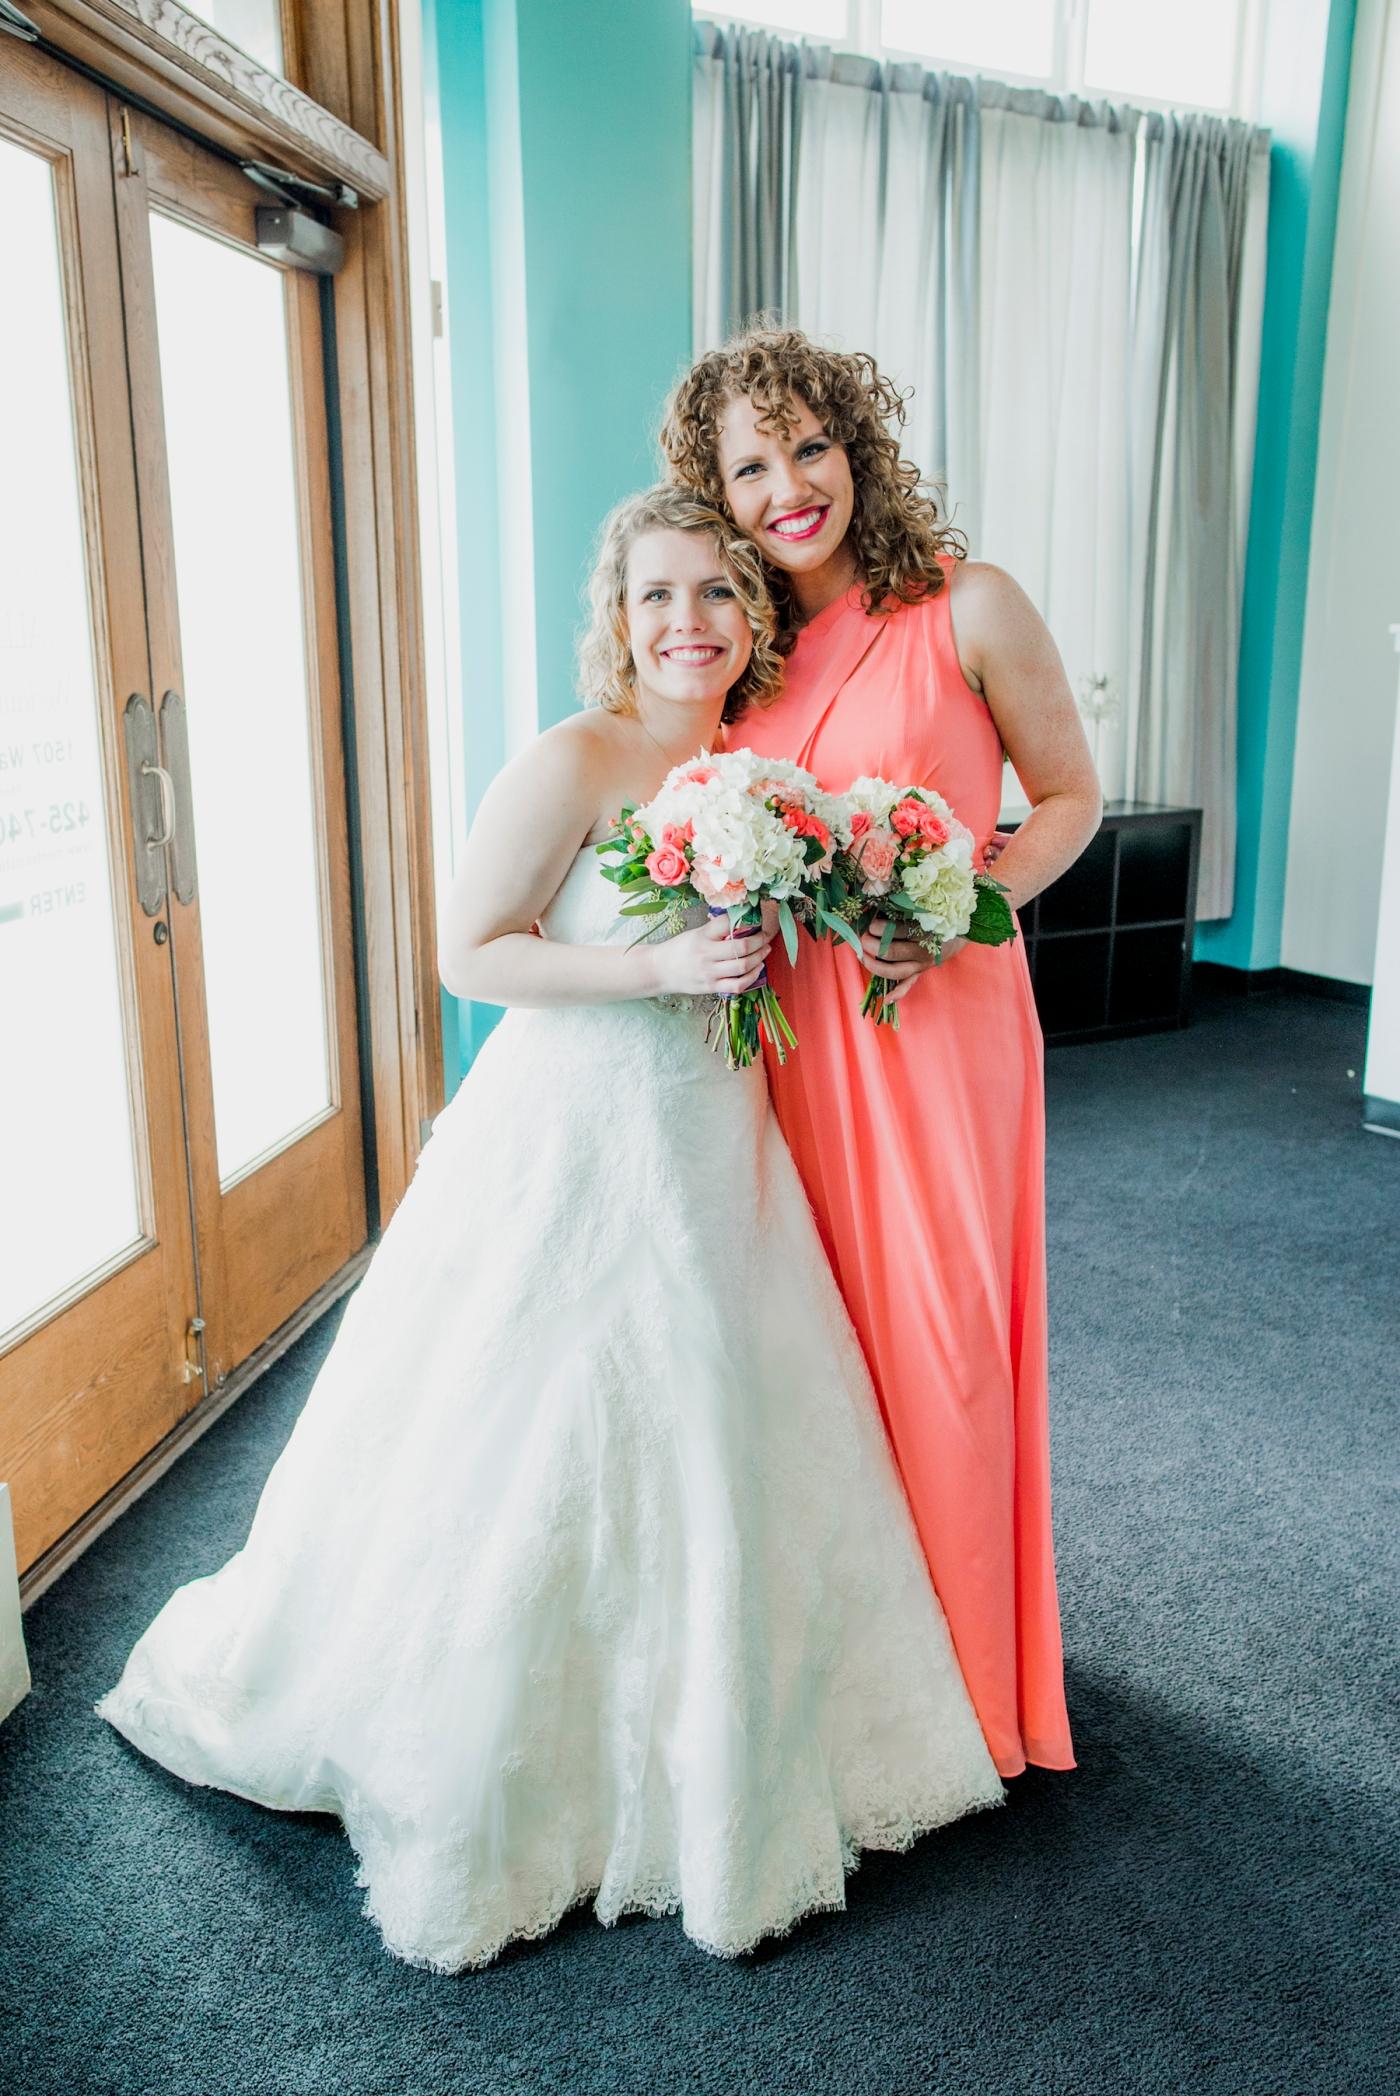 DSC_2835Everett_Wedding_Ballroom_Jane_Speleers_photography_Rachel_and_Edmund_bridesmaids_2017